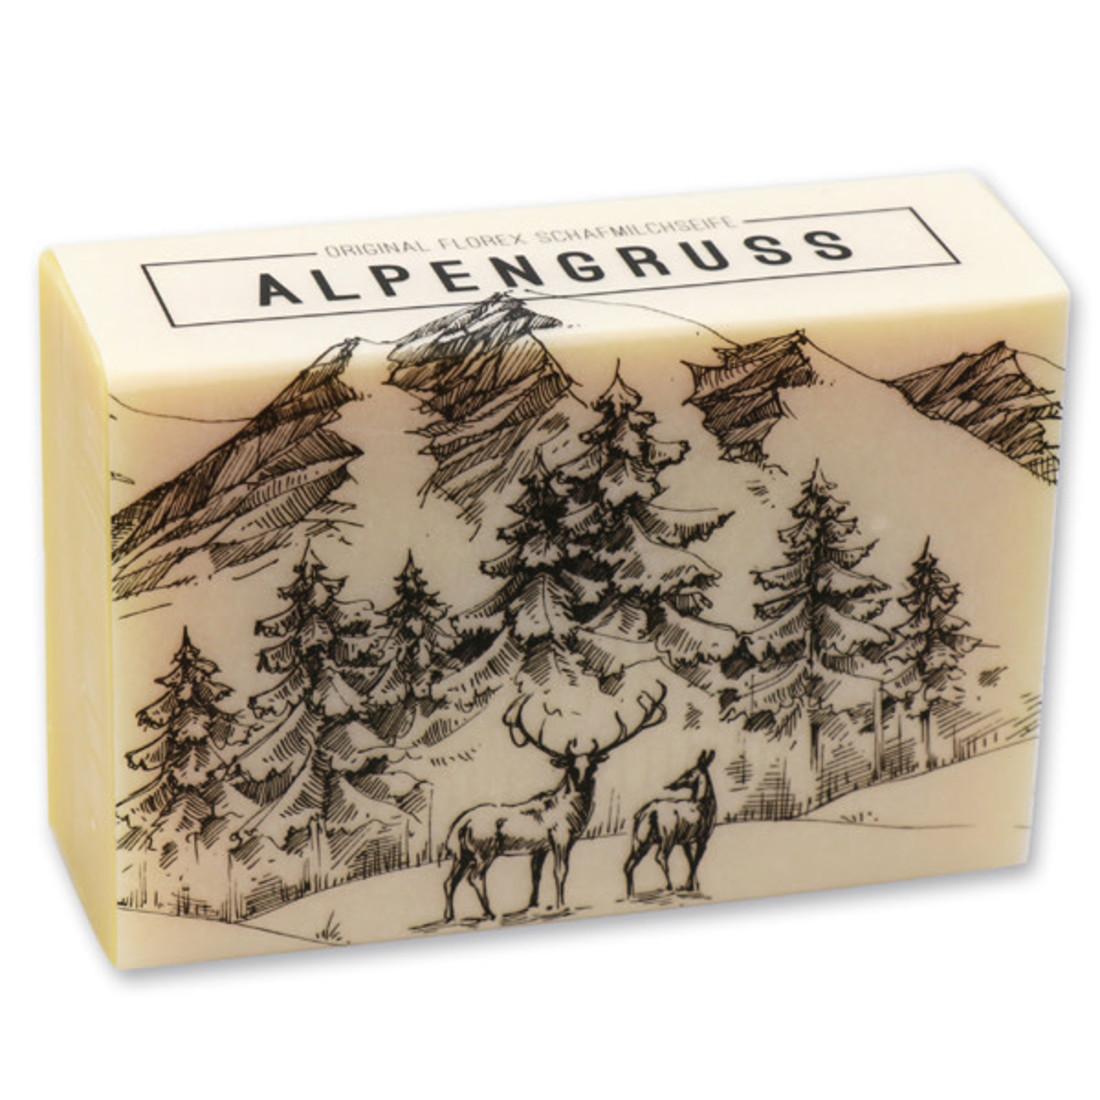 Schafmilchseife Alpenzauber Alpengruss